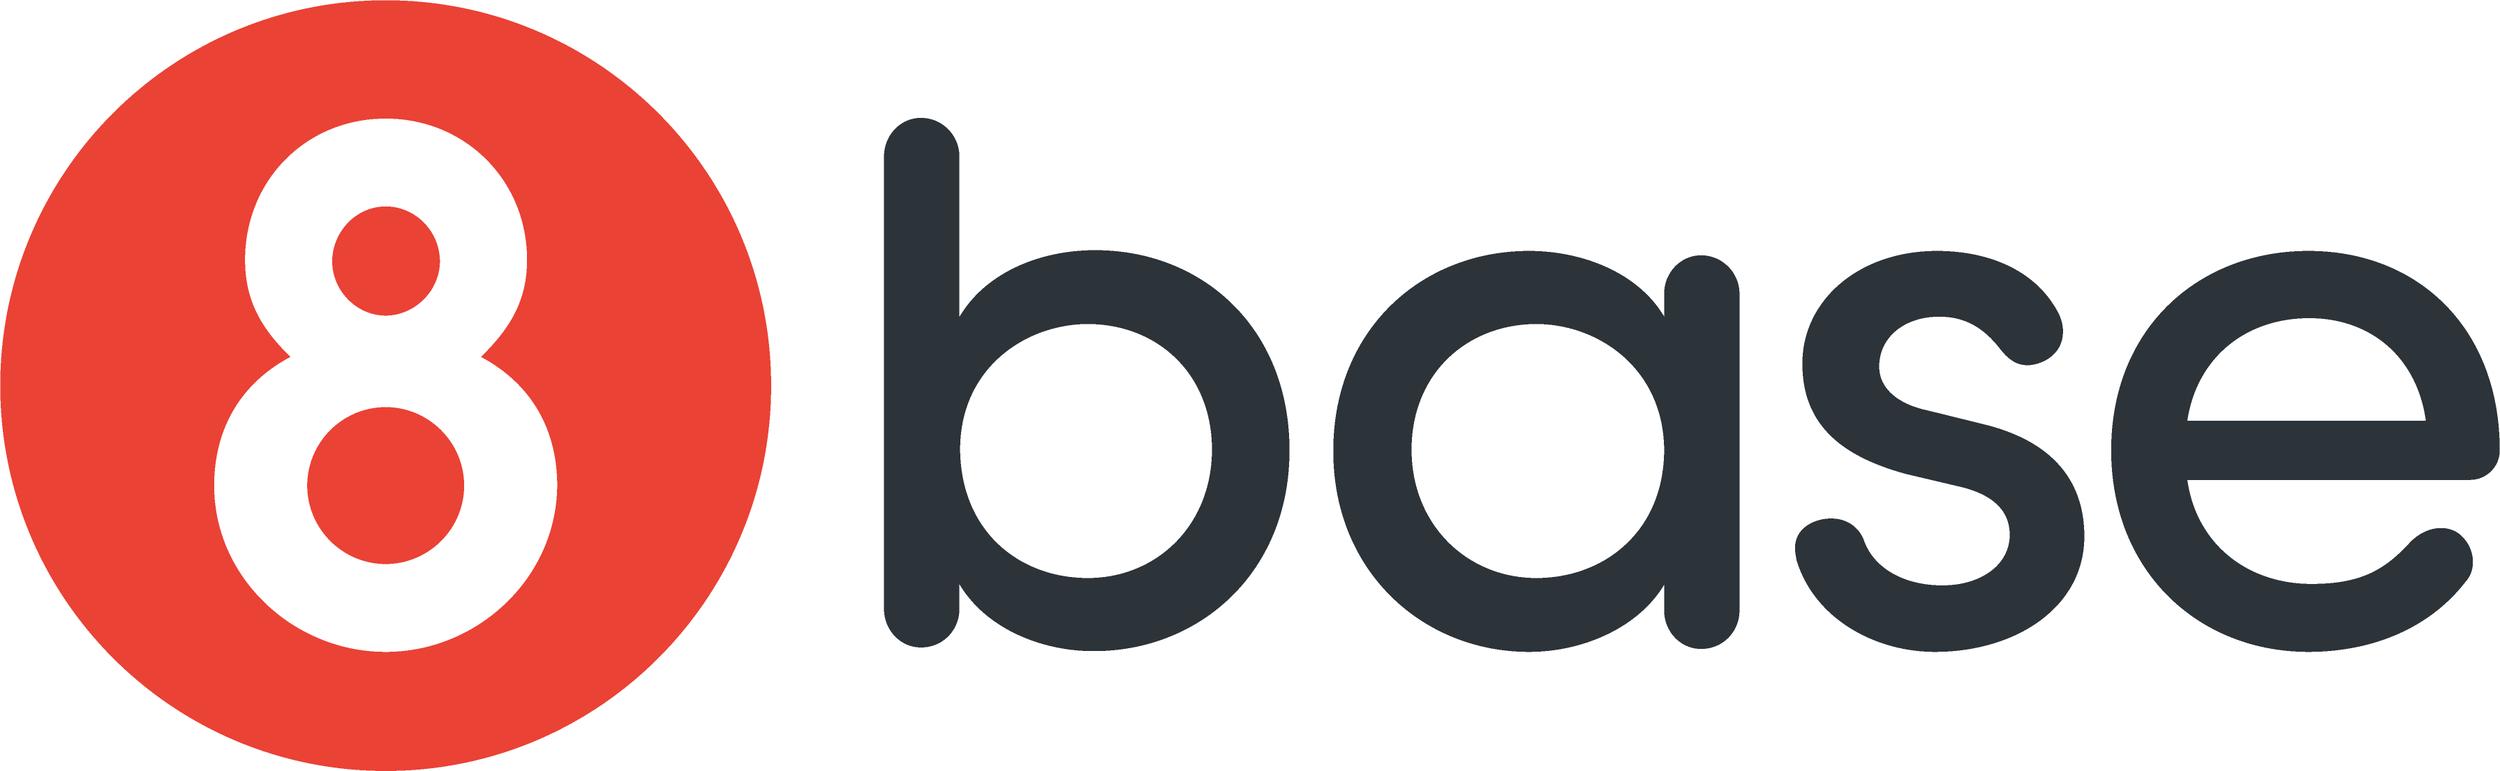 8base_SUA_logo.png